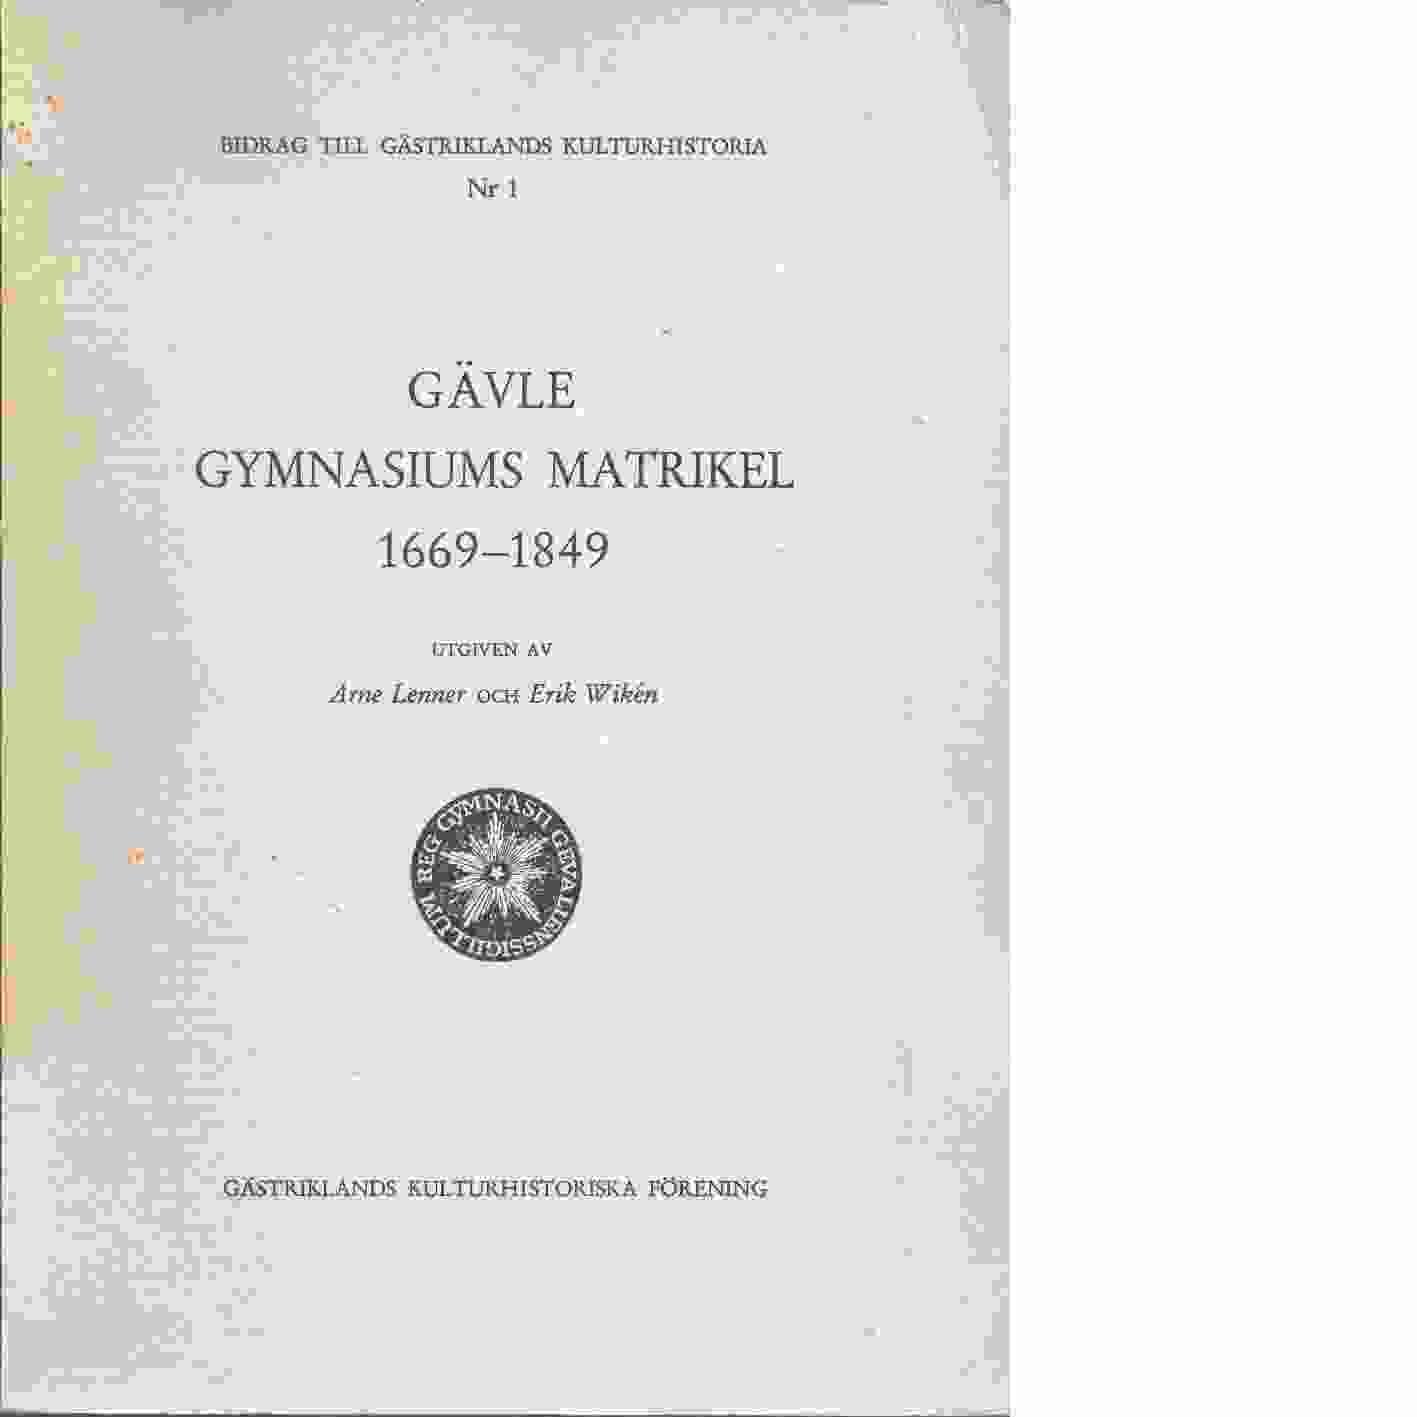 Gävle gymnasiums matrikel 1669-1849 - Red. Wikén, Erik och Lenner, Arne